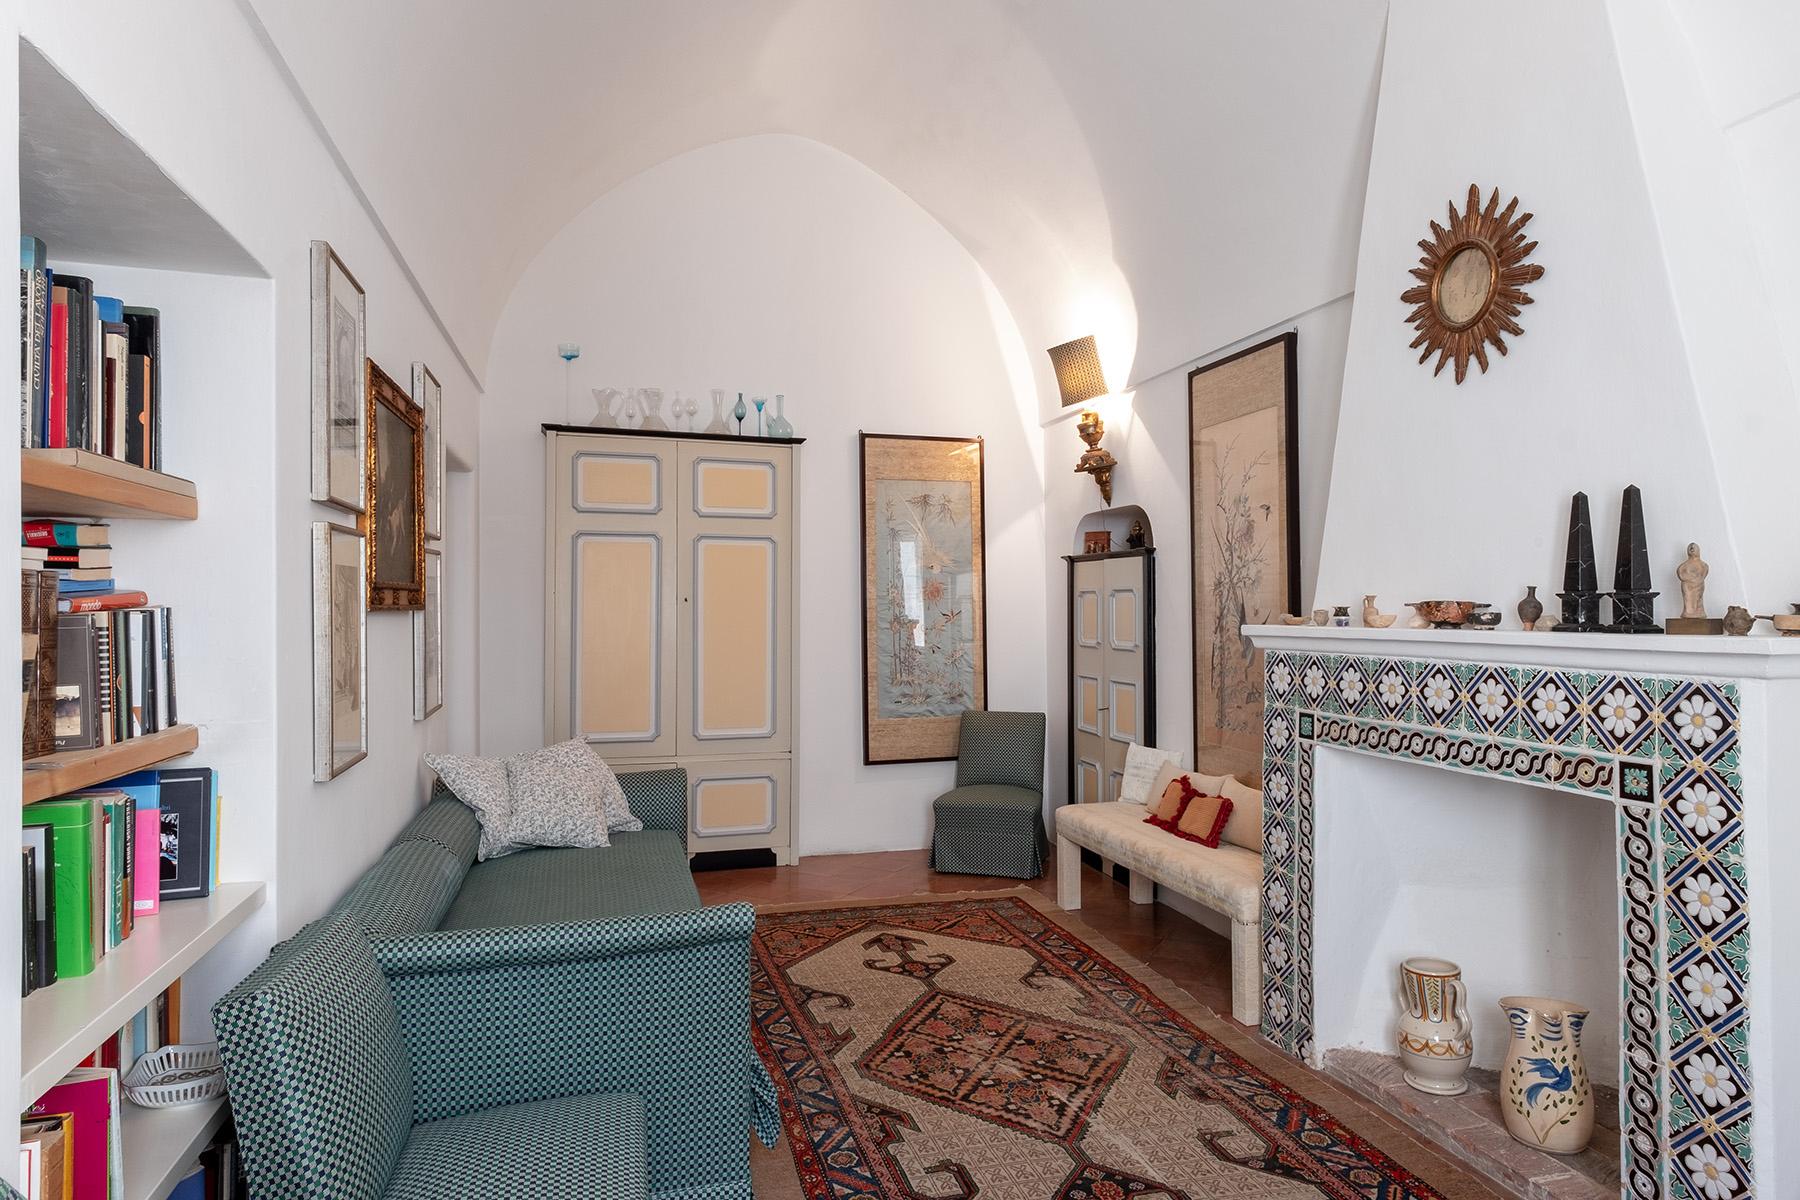 Casa indipendente in Vendita a Capri: 5 locali, 300 mq - Foto 18